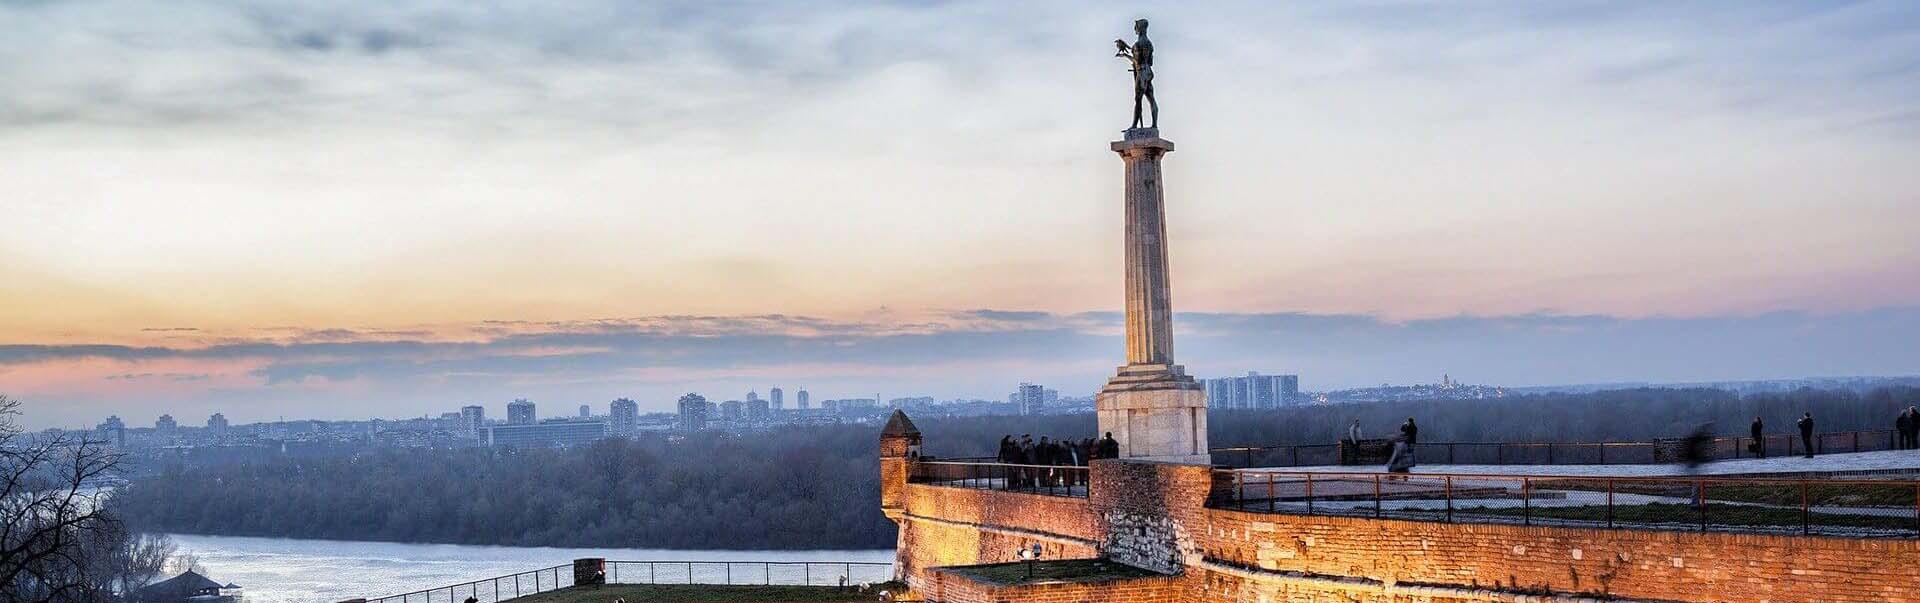 Dostava hrane Kalemegdan | Beograd